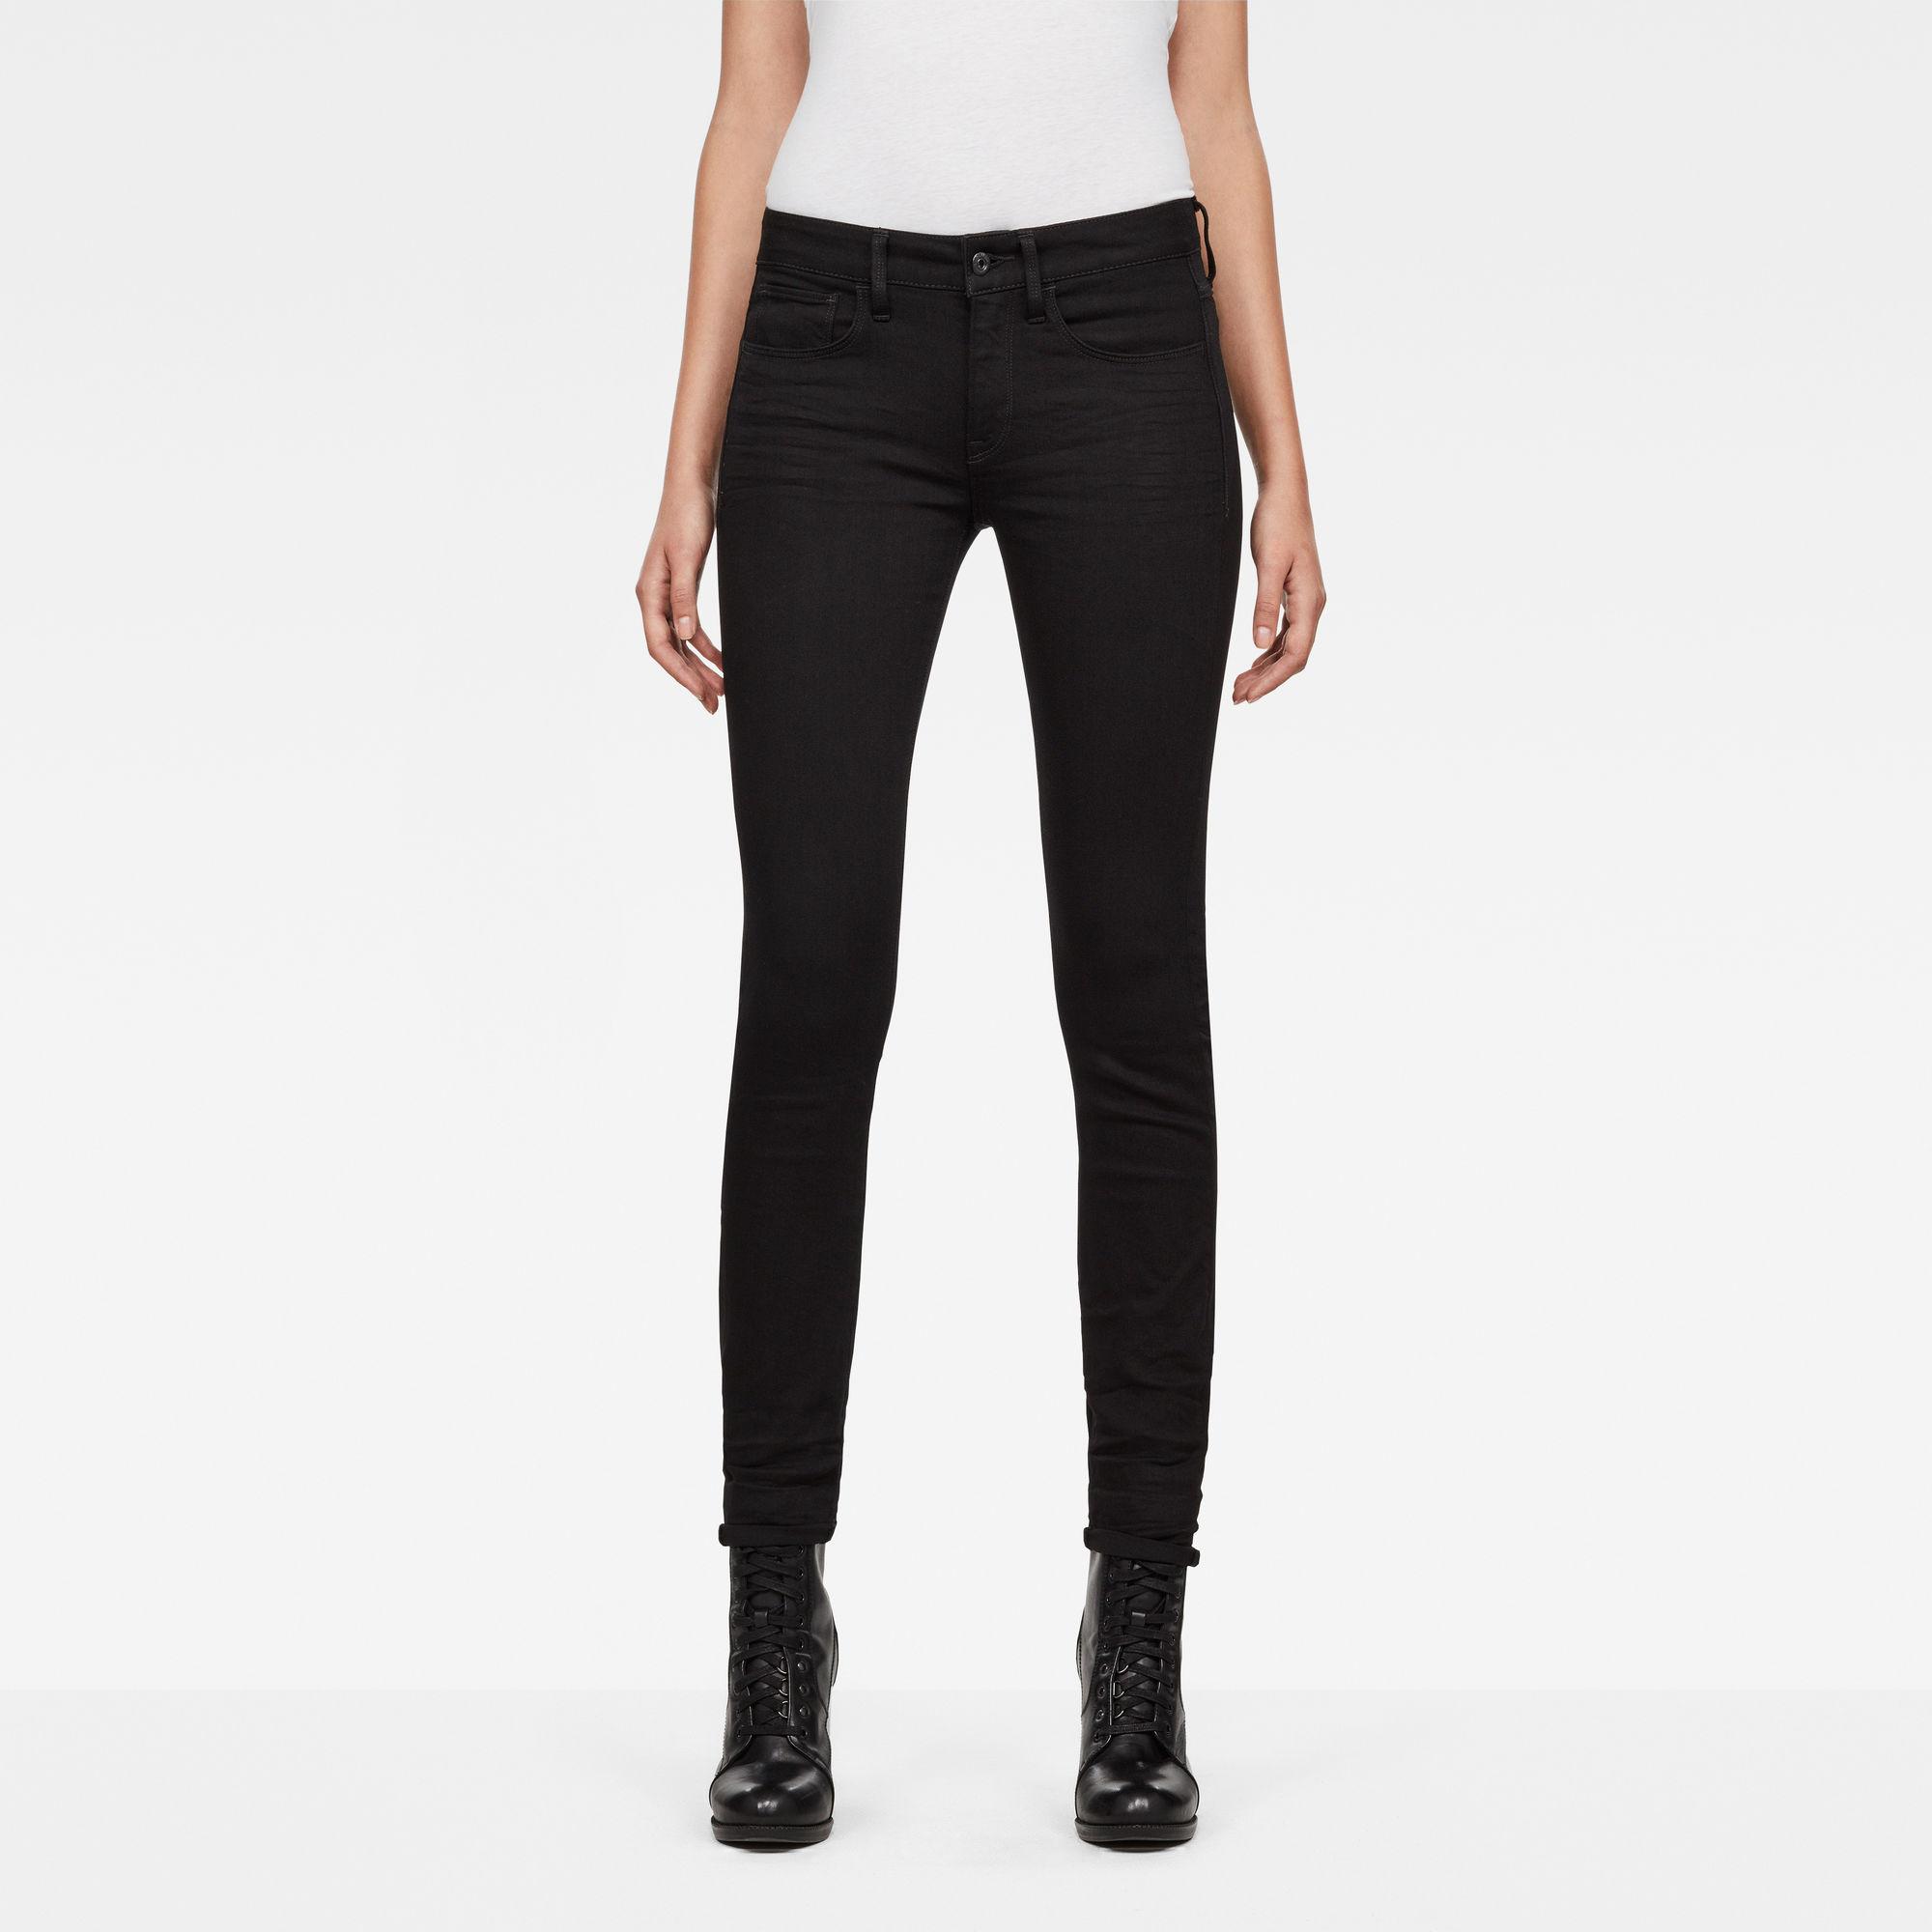 Imagem de 3301 Deconstructed Mid-Waist Skinny Jeans